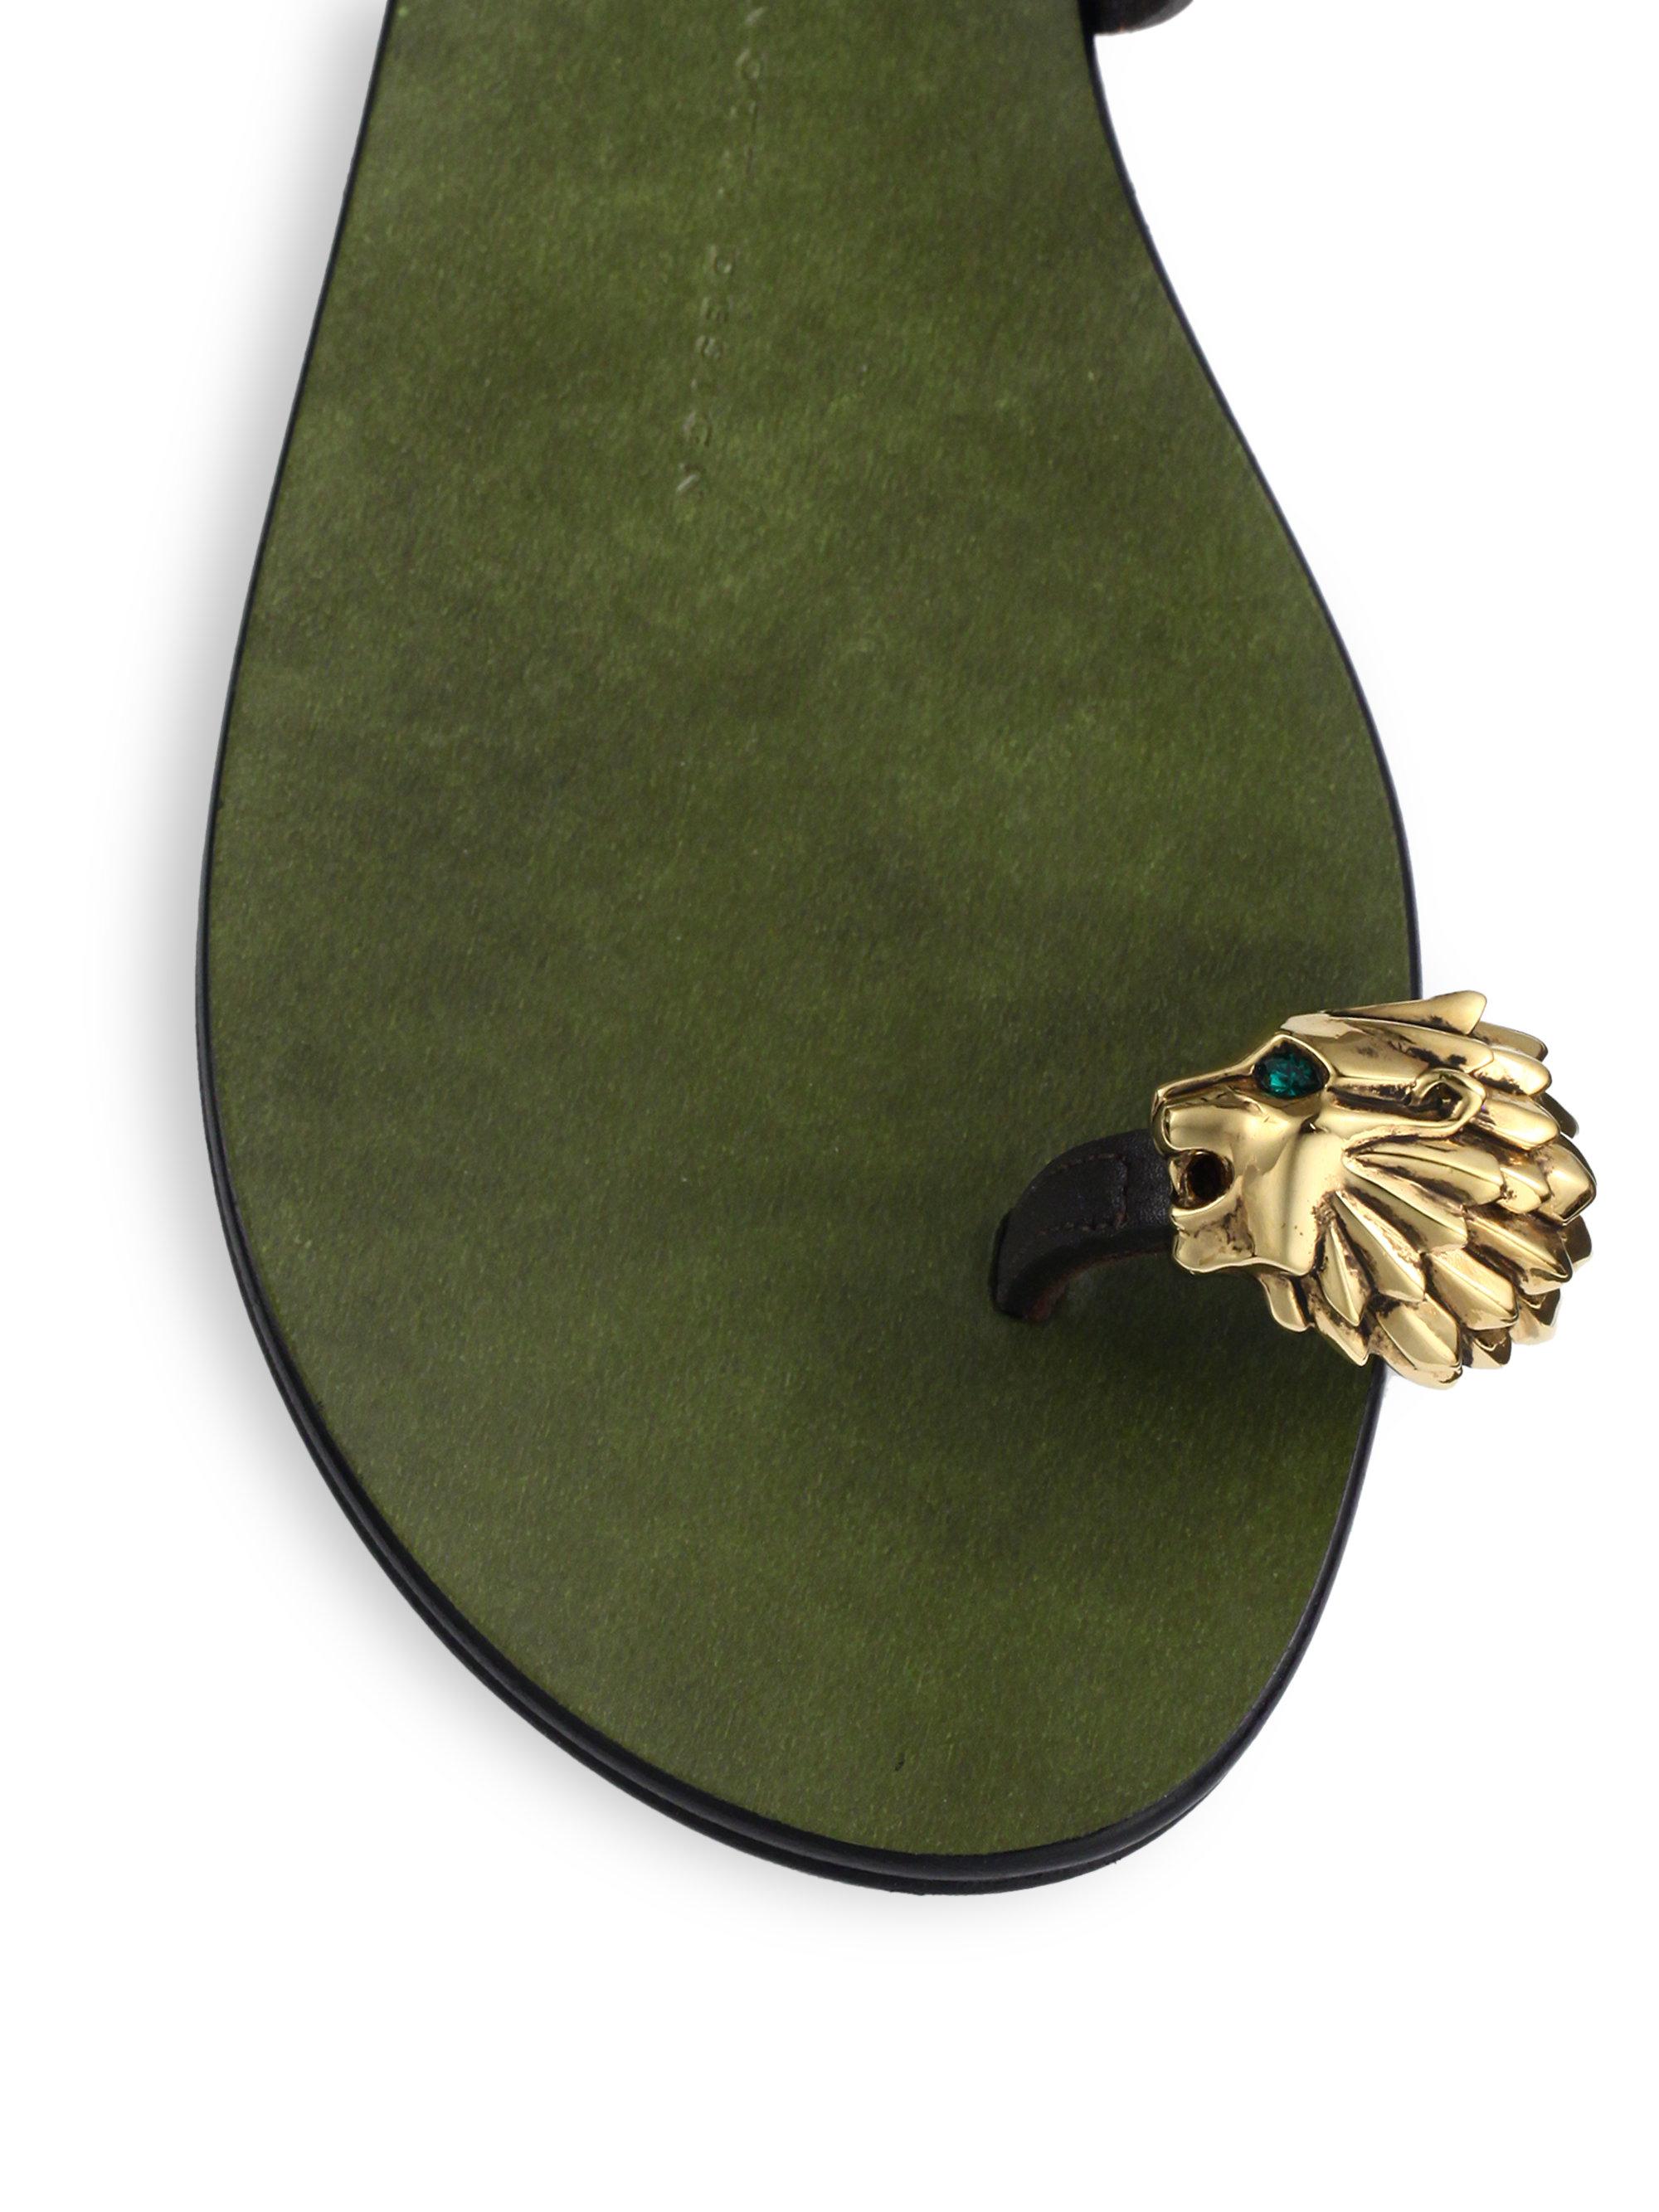 cadd1d5b1d5f7 Giuseppe Zanotti Metallic Lion Toe Ring Leather Sandals in Green - Lyst